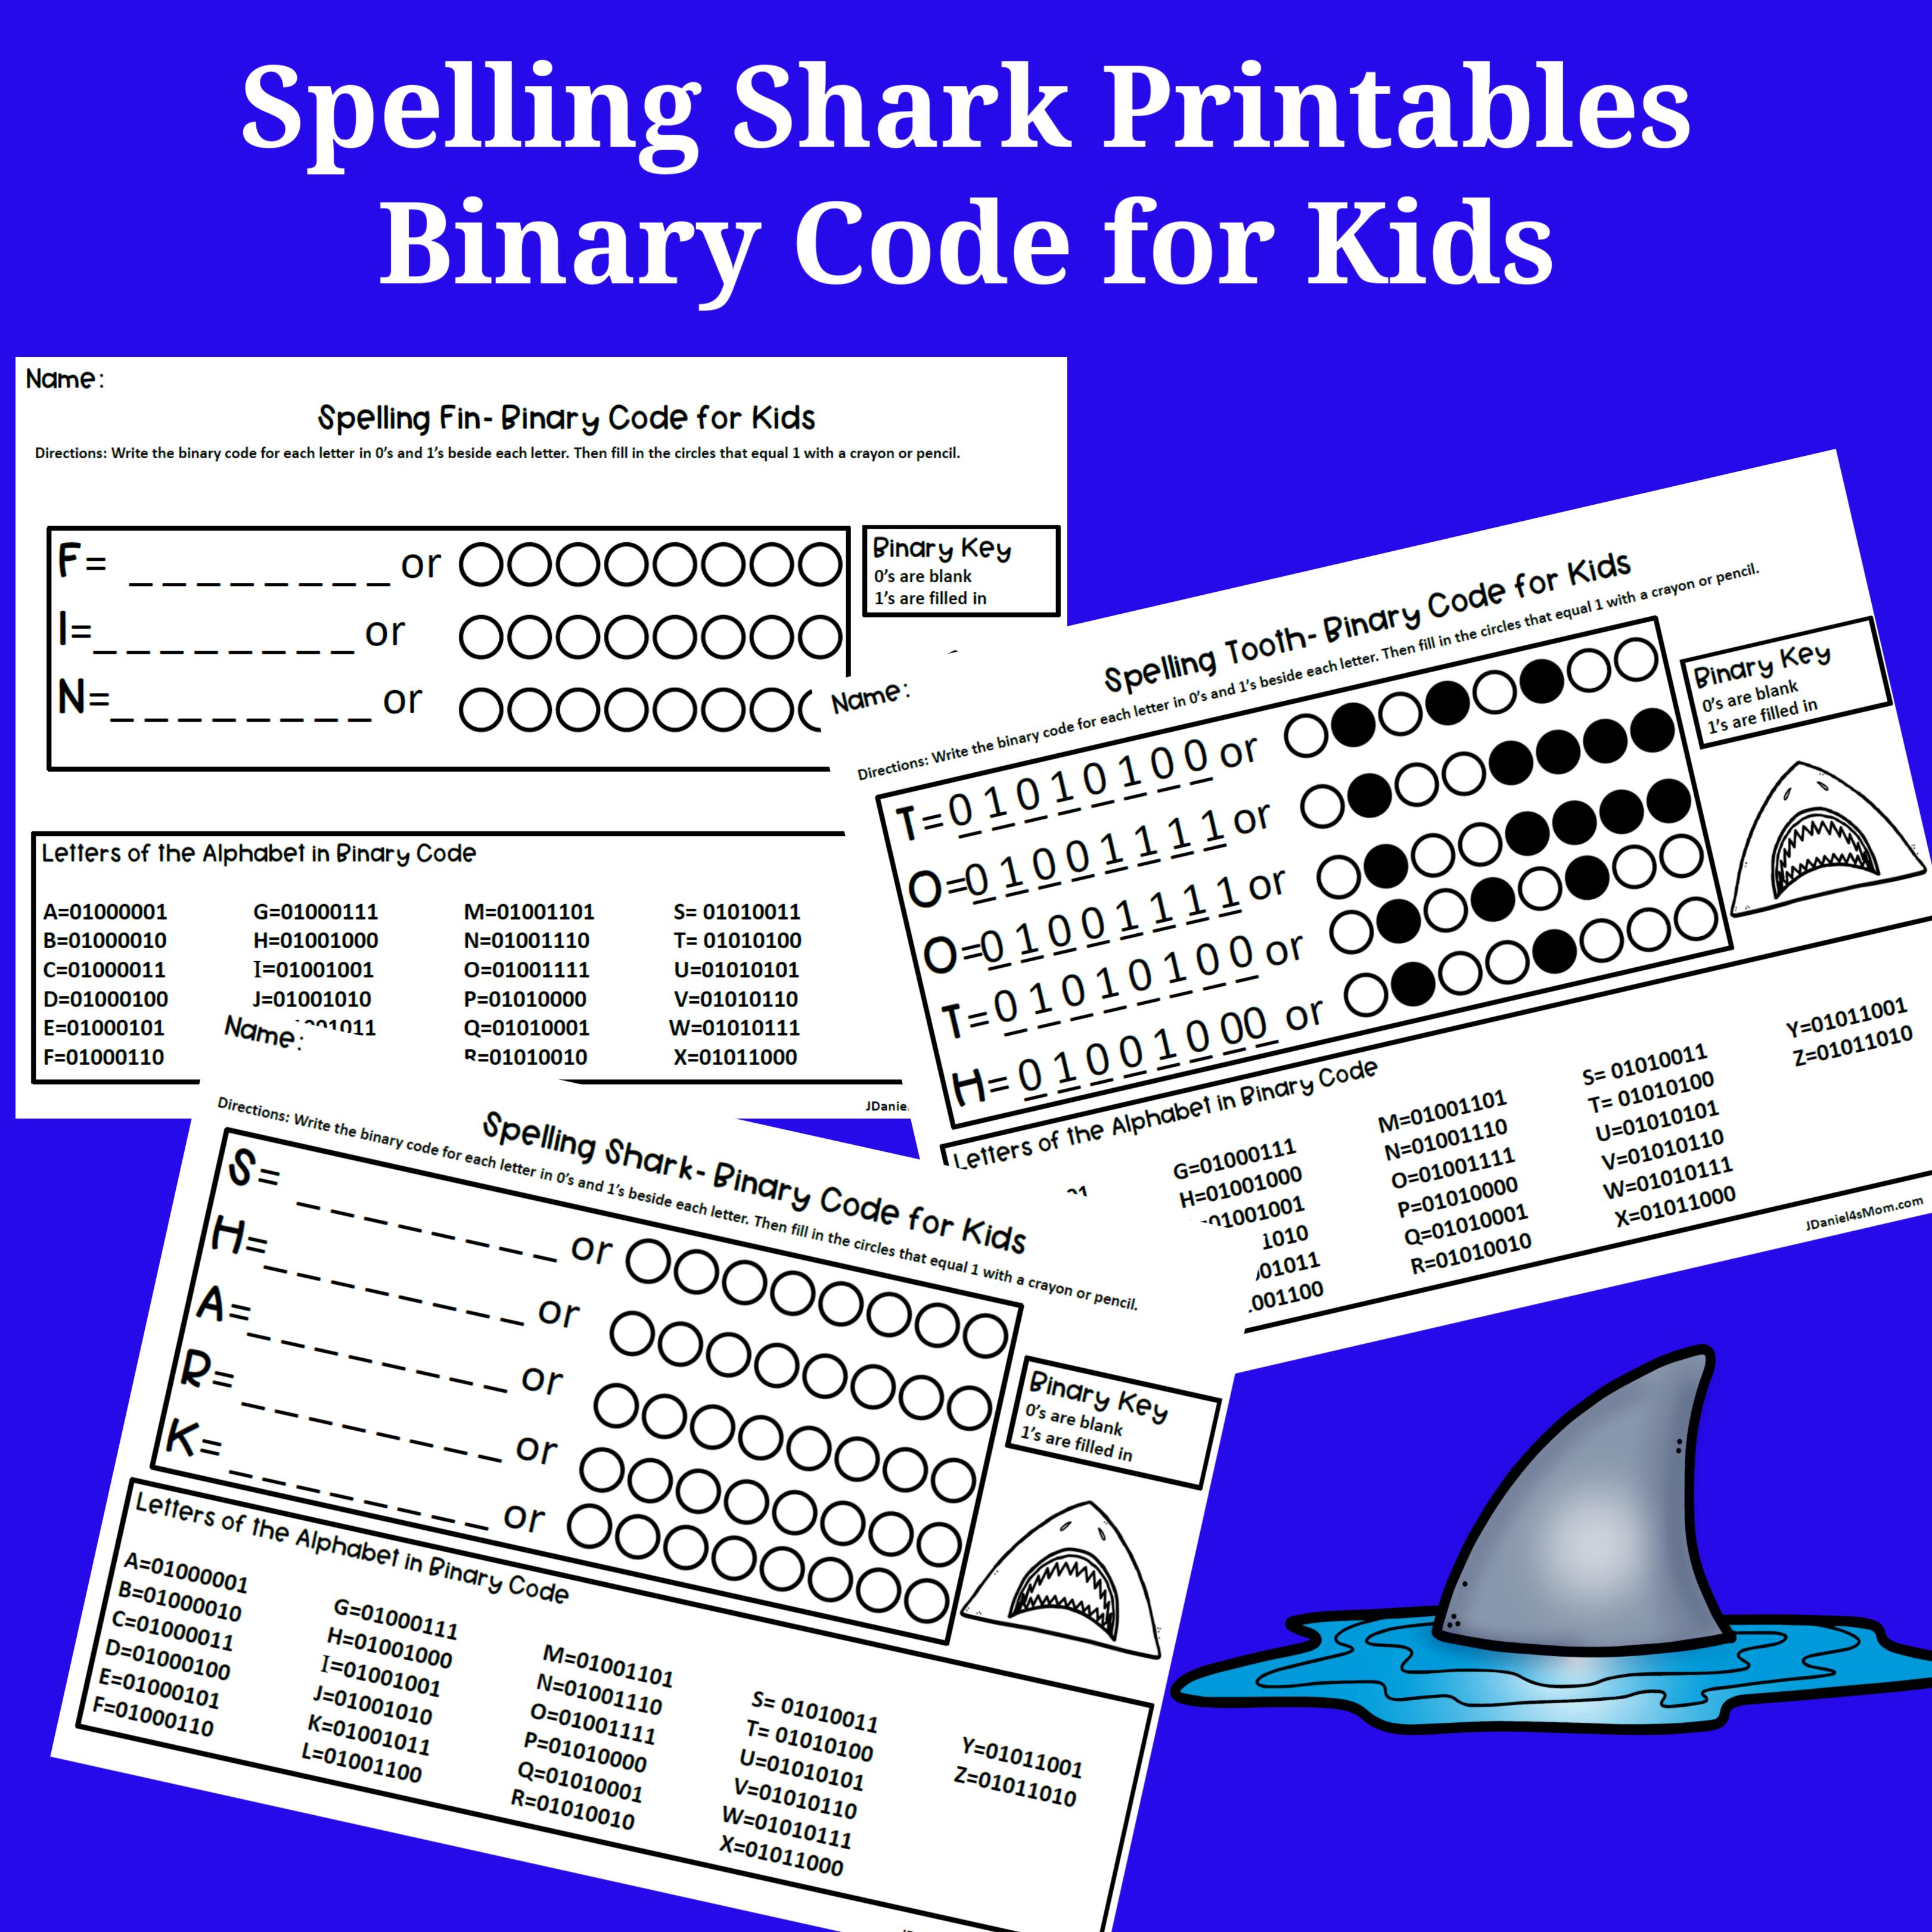 Binary Code For Kids Spelling Shark Printables Jdaniel4s Mom Coding For Kids Spelling For Kids Coding [ 3242 x 3242 Pixel ]